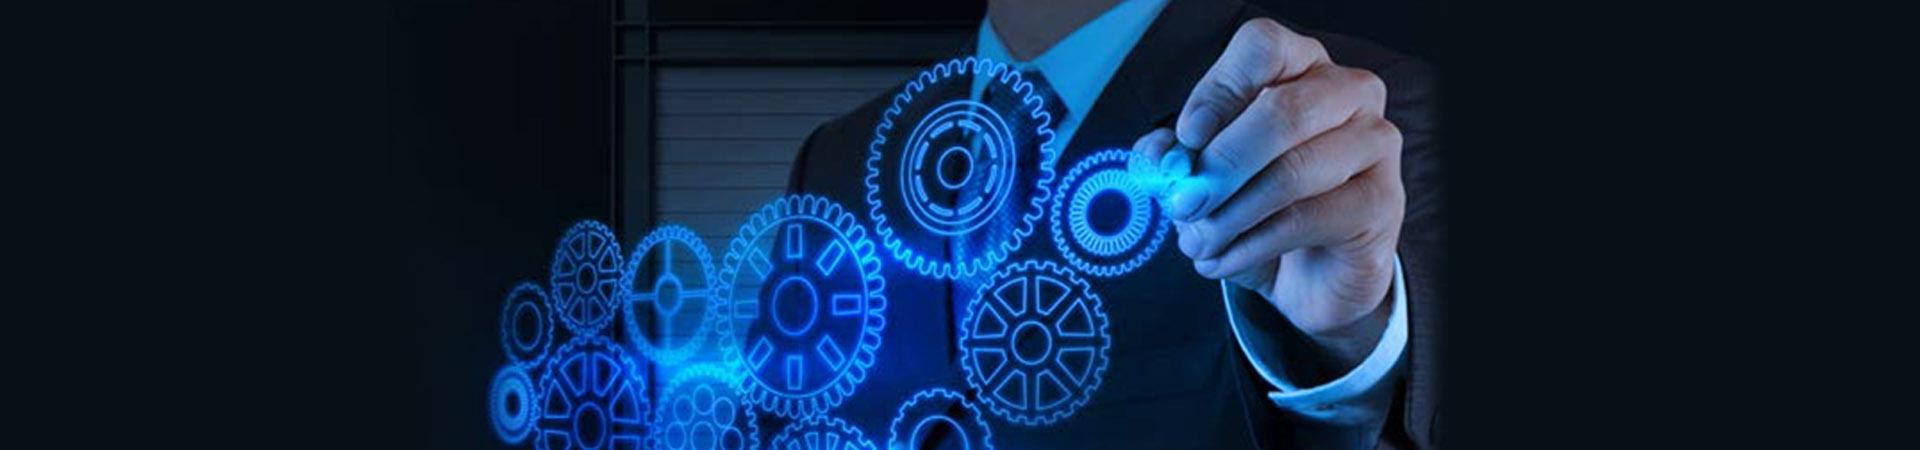 system integrators in india